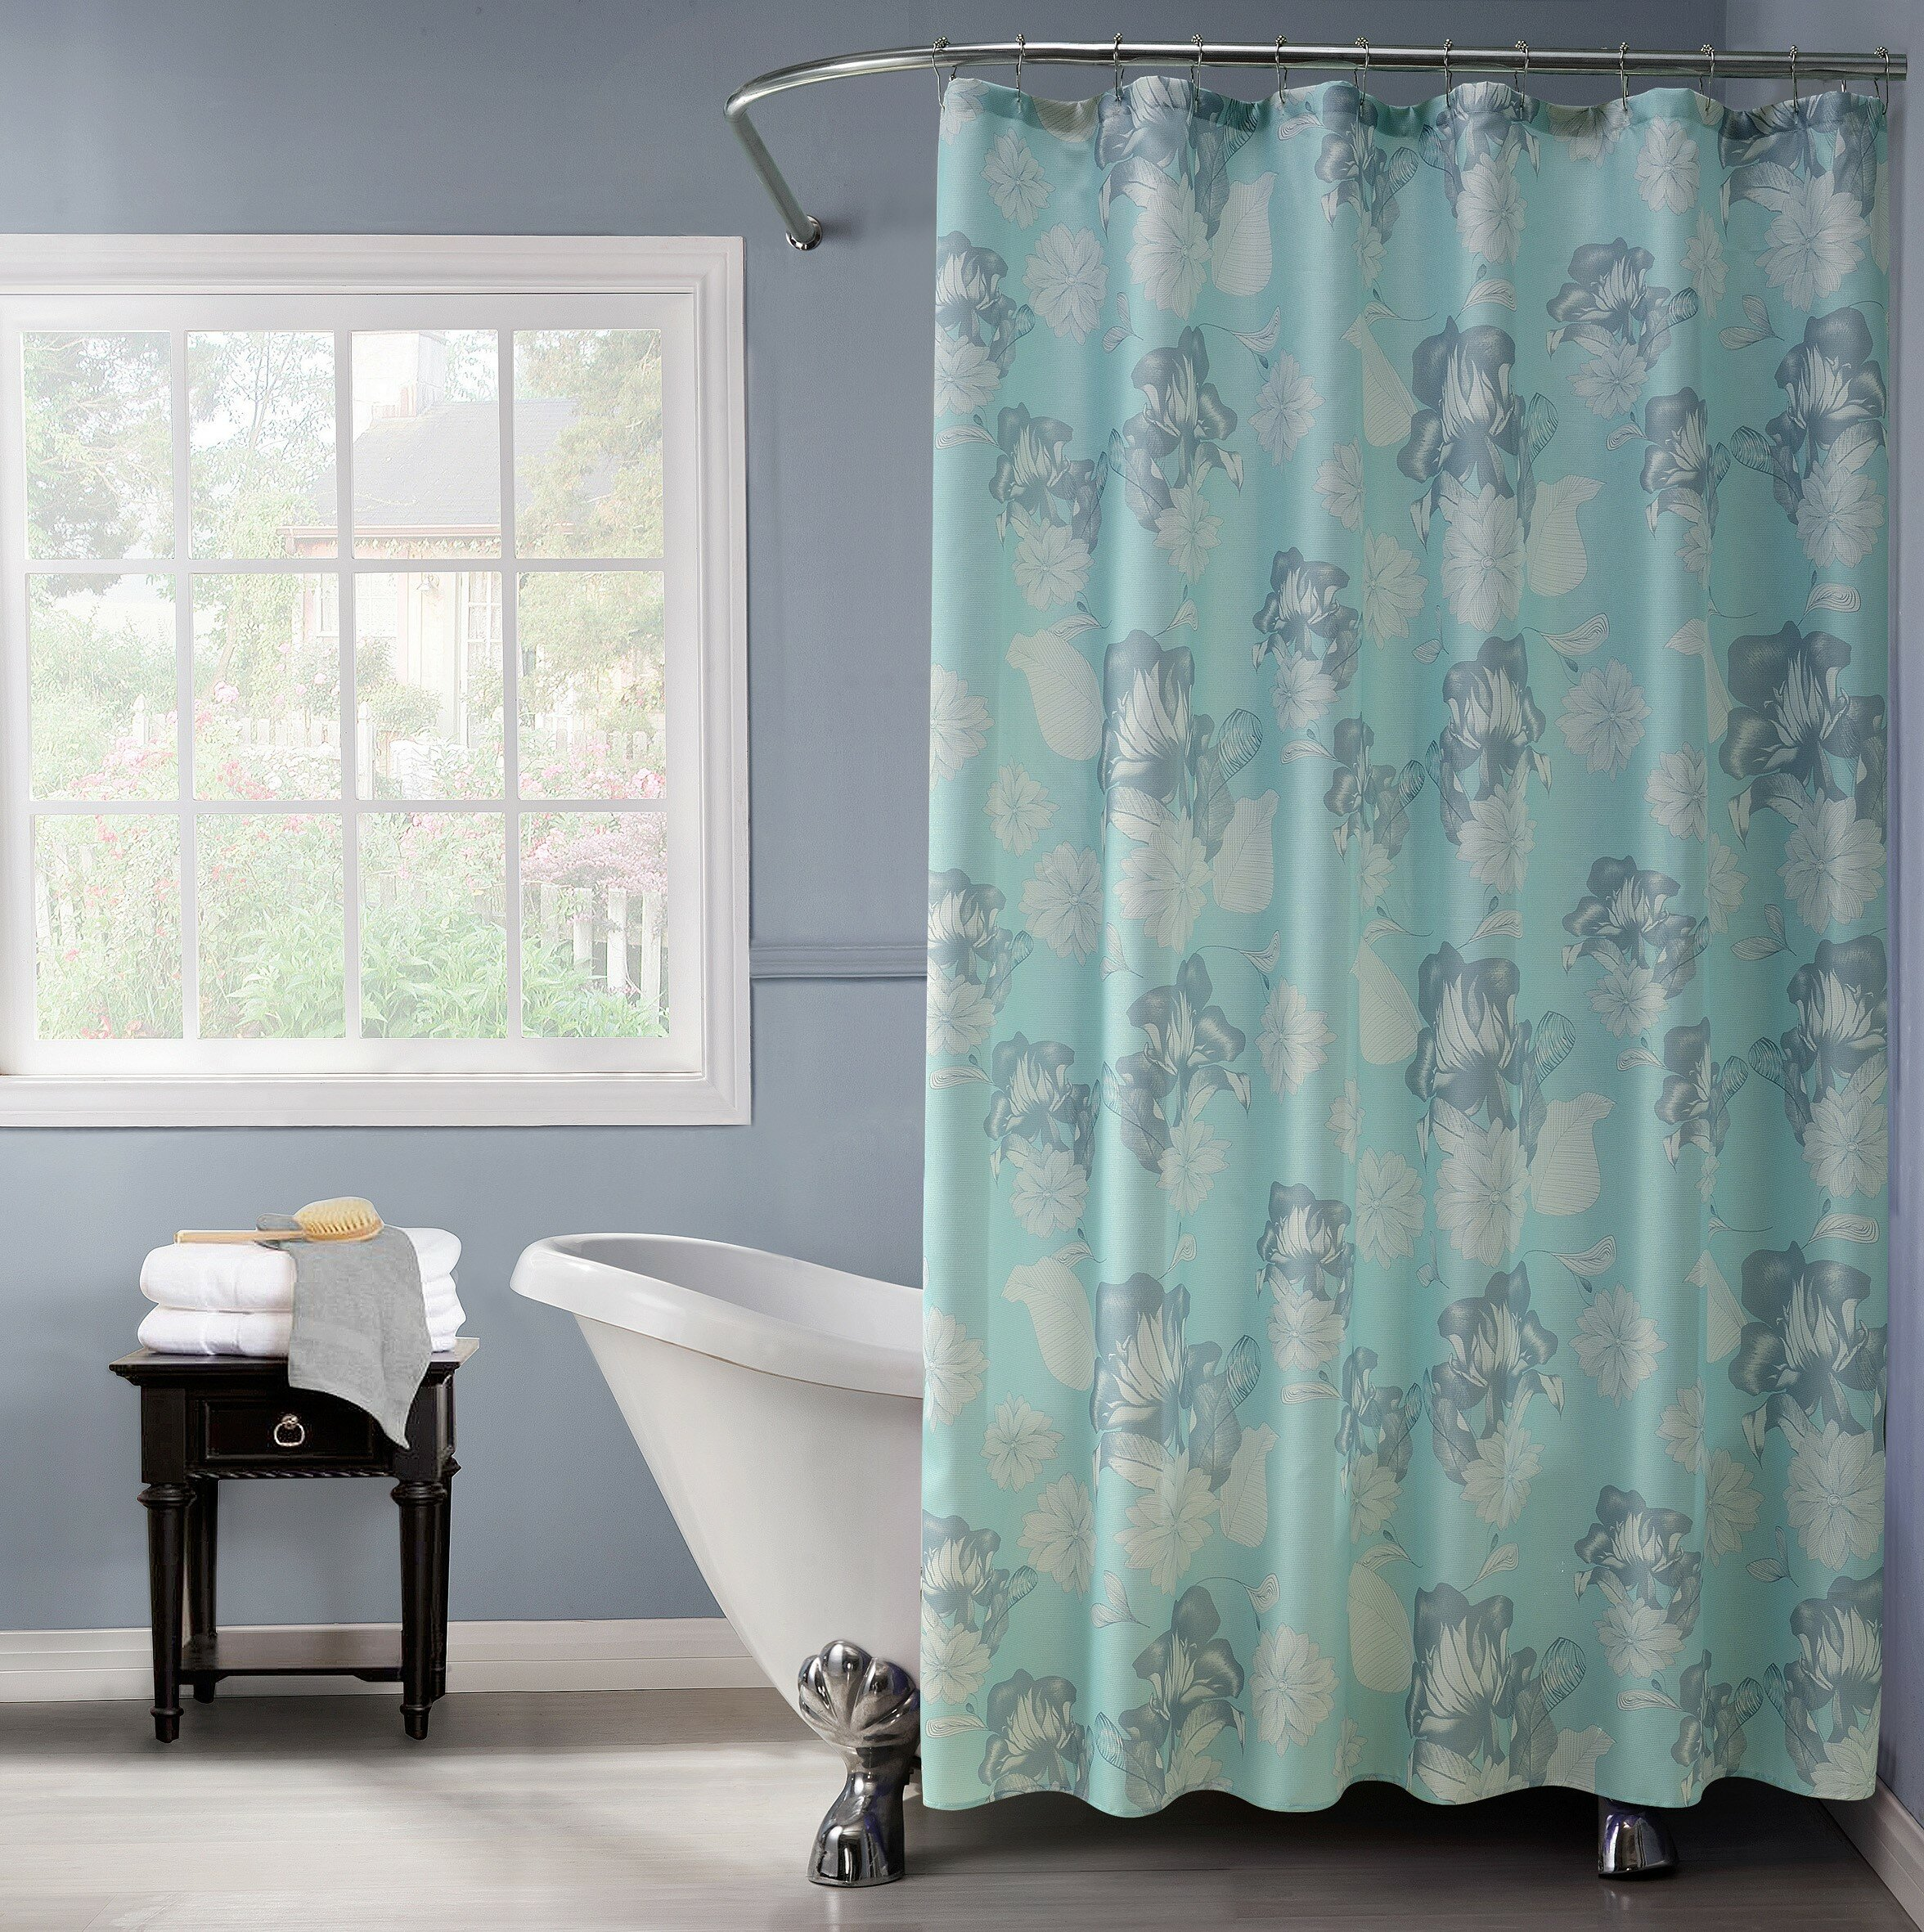 Charlton Home Rexdale Printed Shower Curtain Set | Wayfair